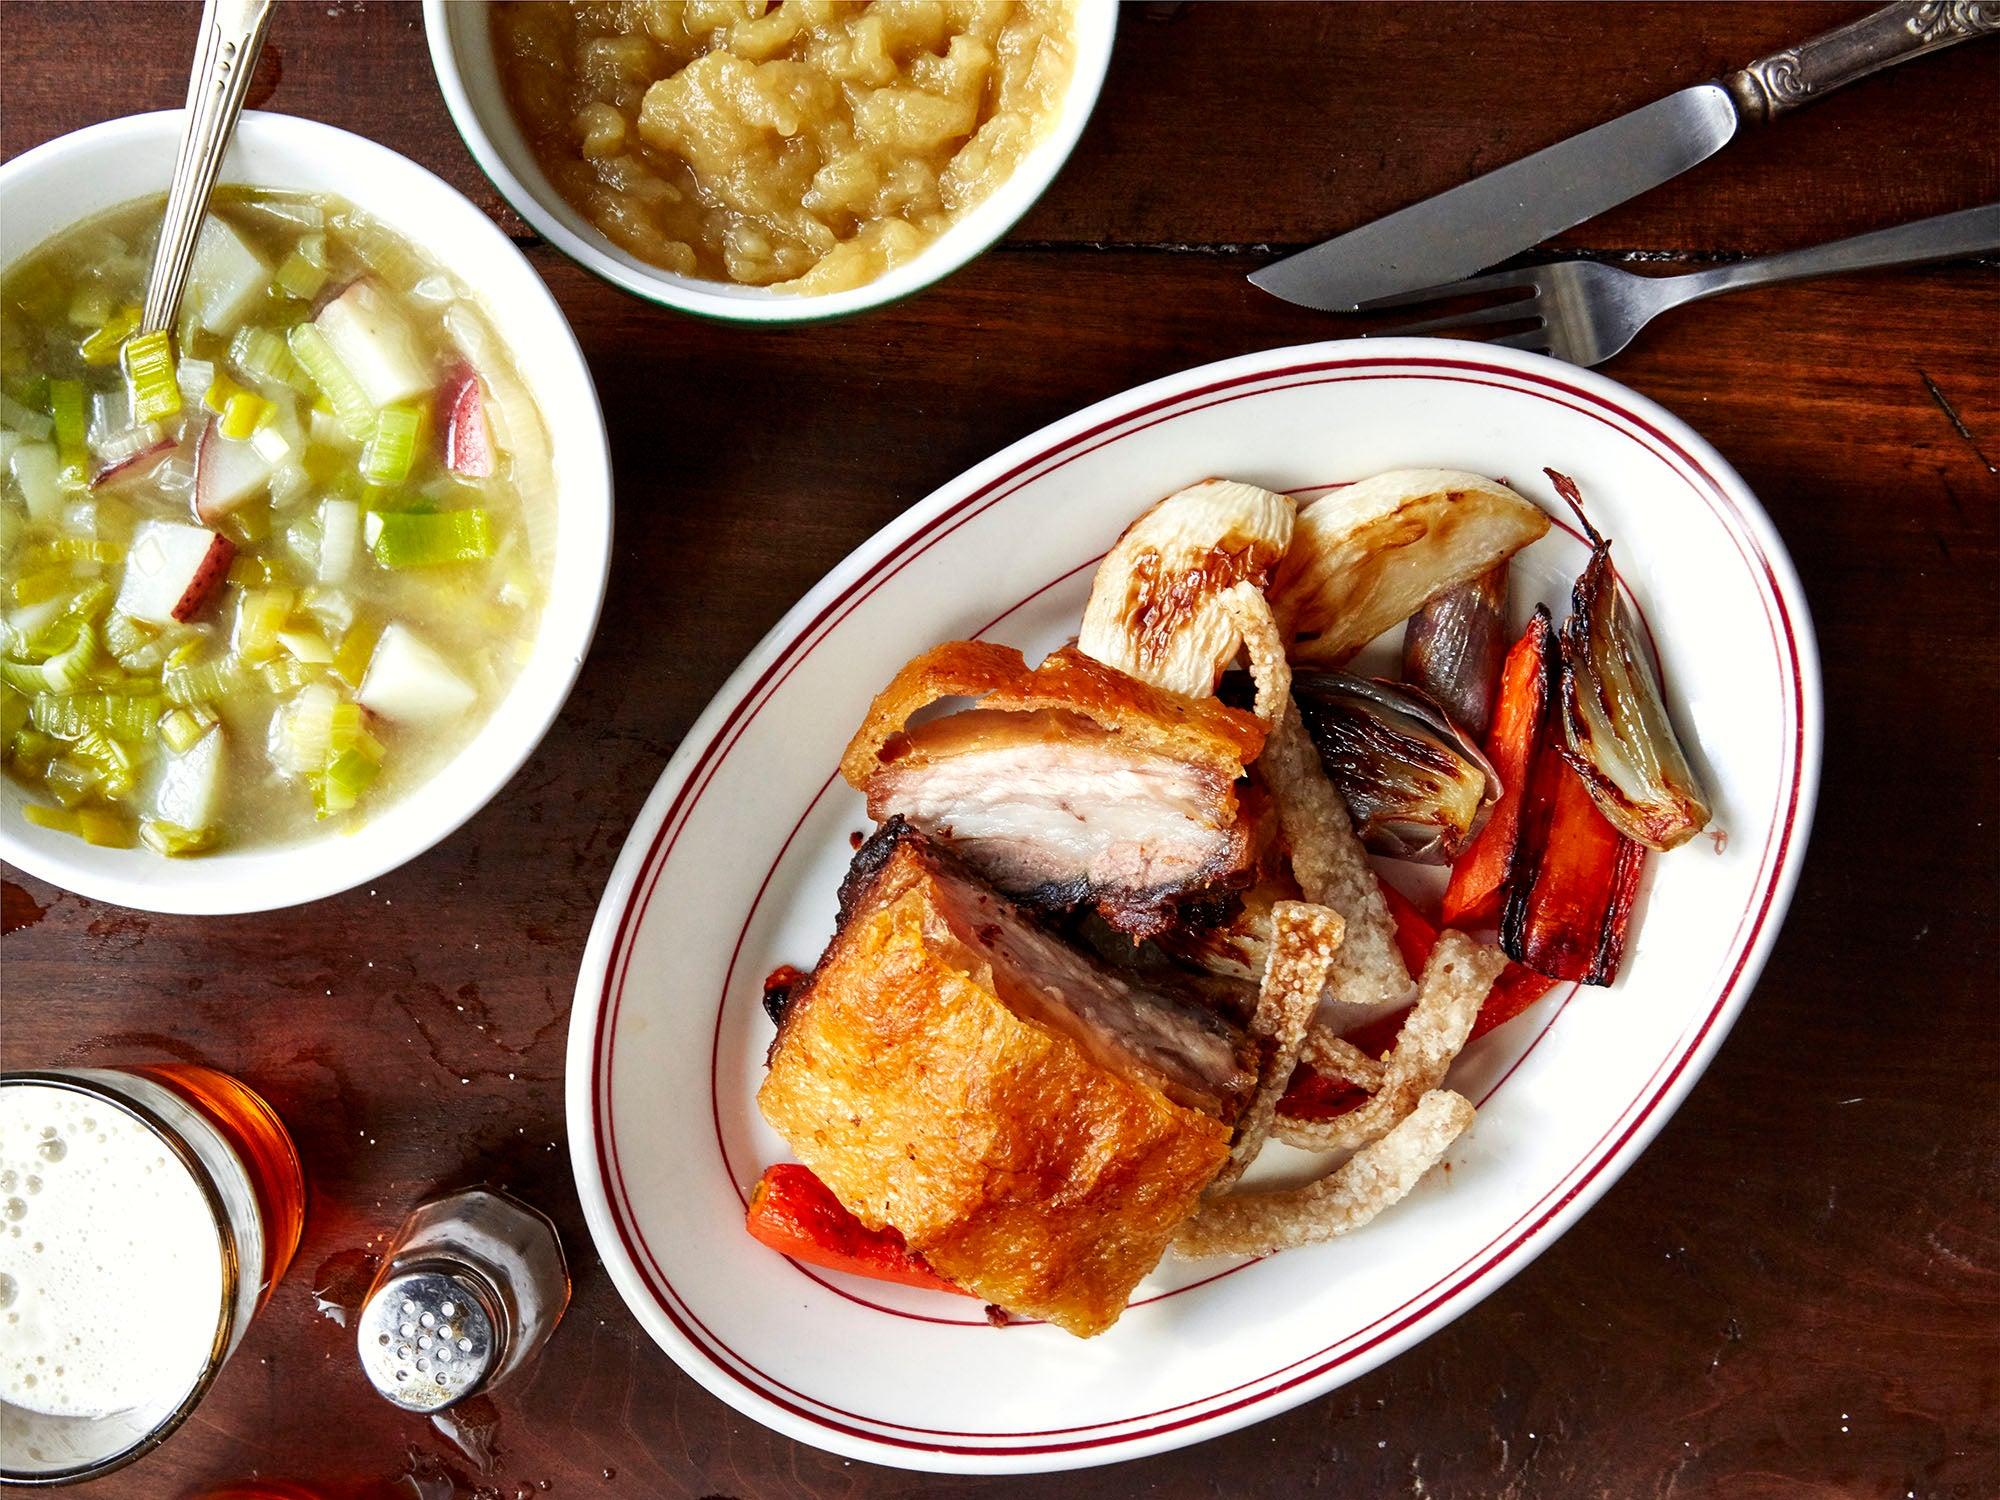 Crisp Pork Belly with Roasted Vegetables and Applesauce